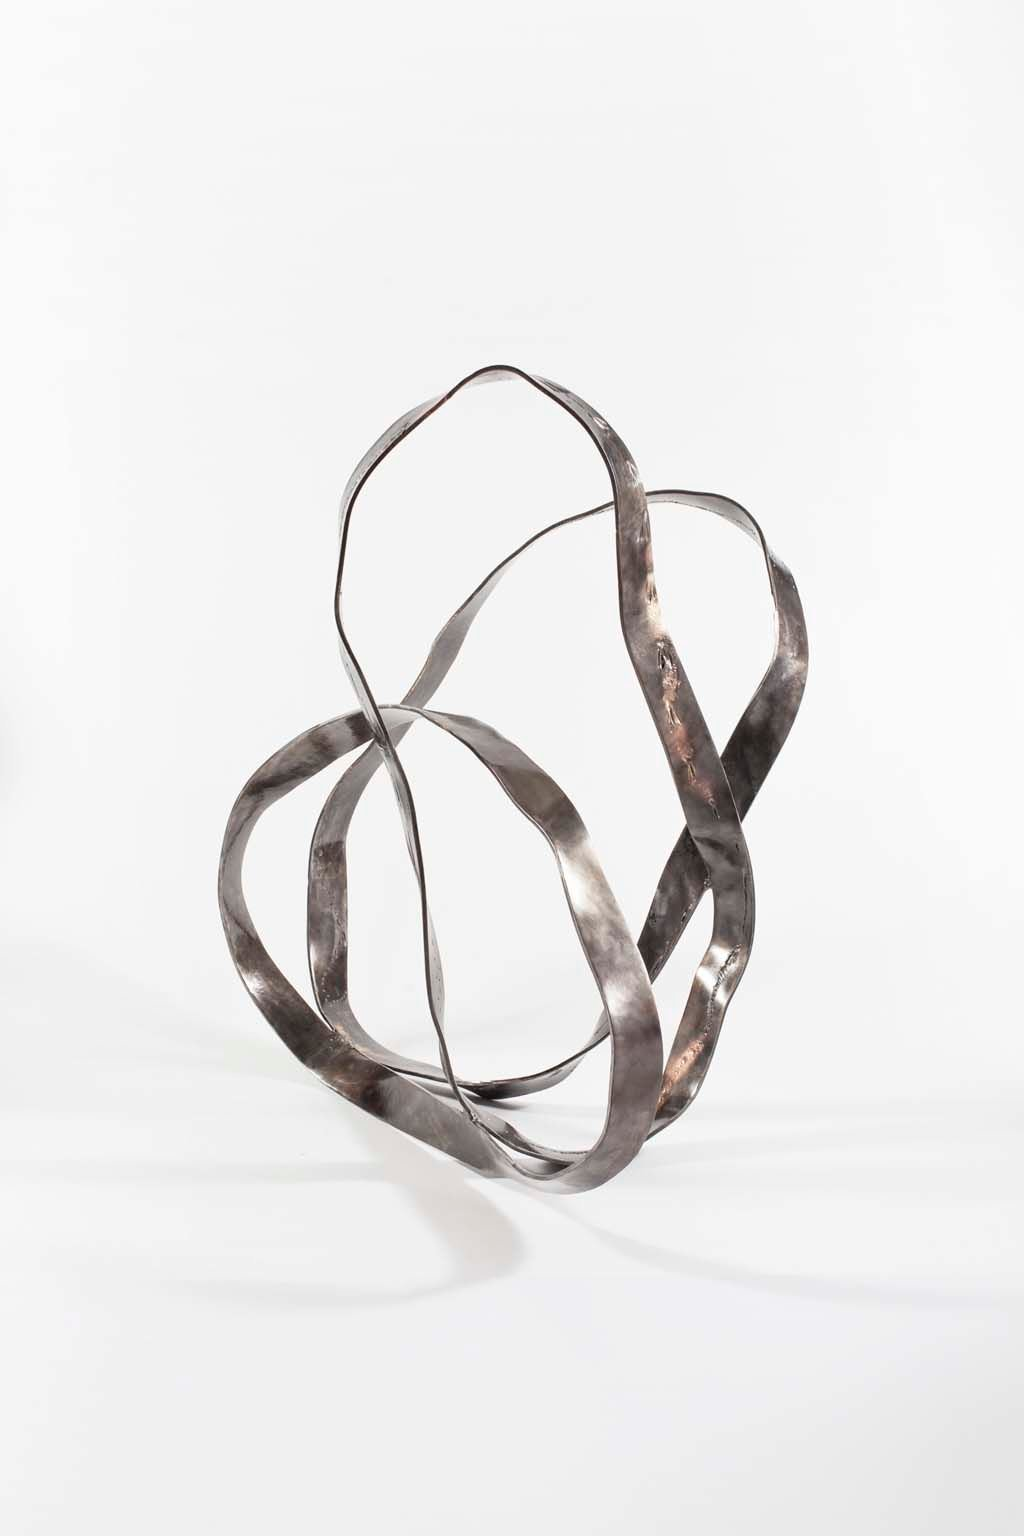 Oblivion II | 2015 I  Iron & brass sculpture | Rami Ater | רמי אטר